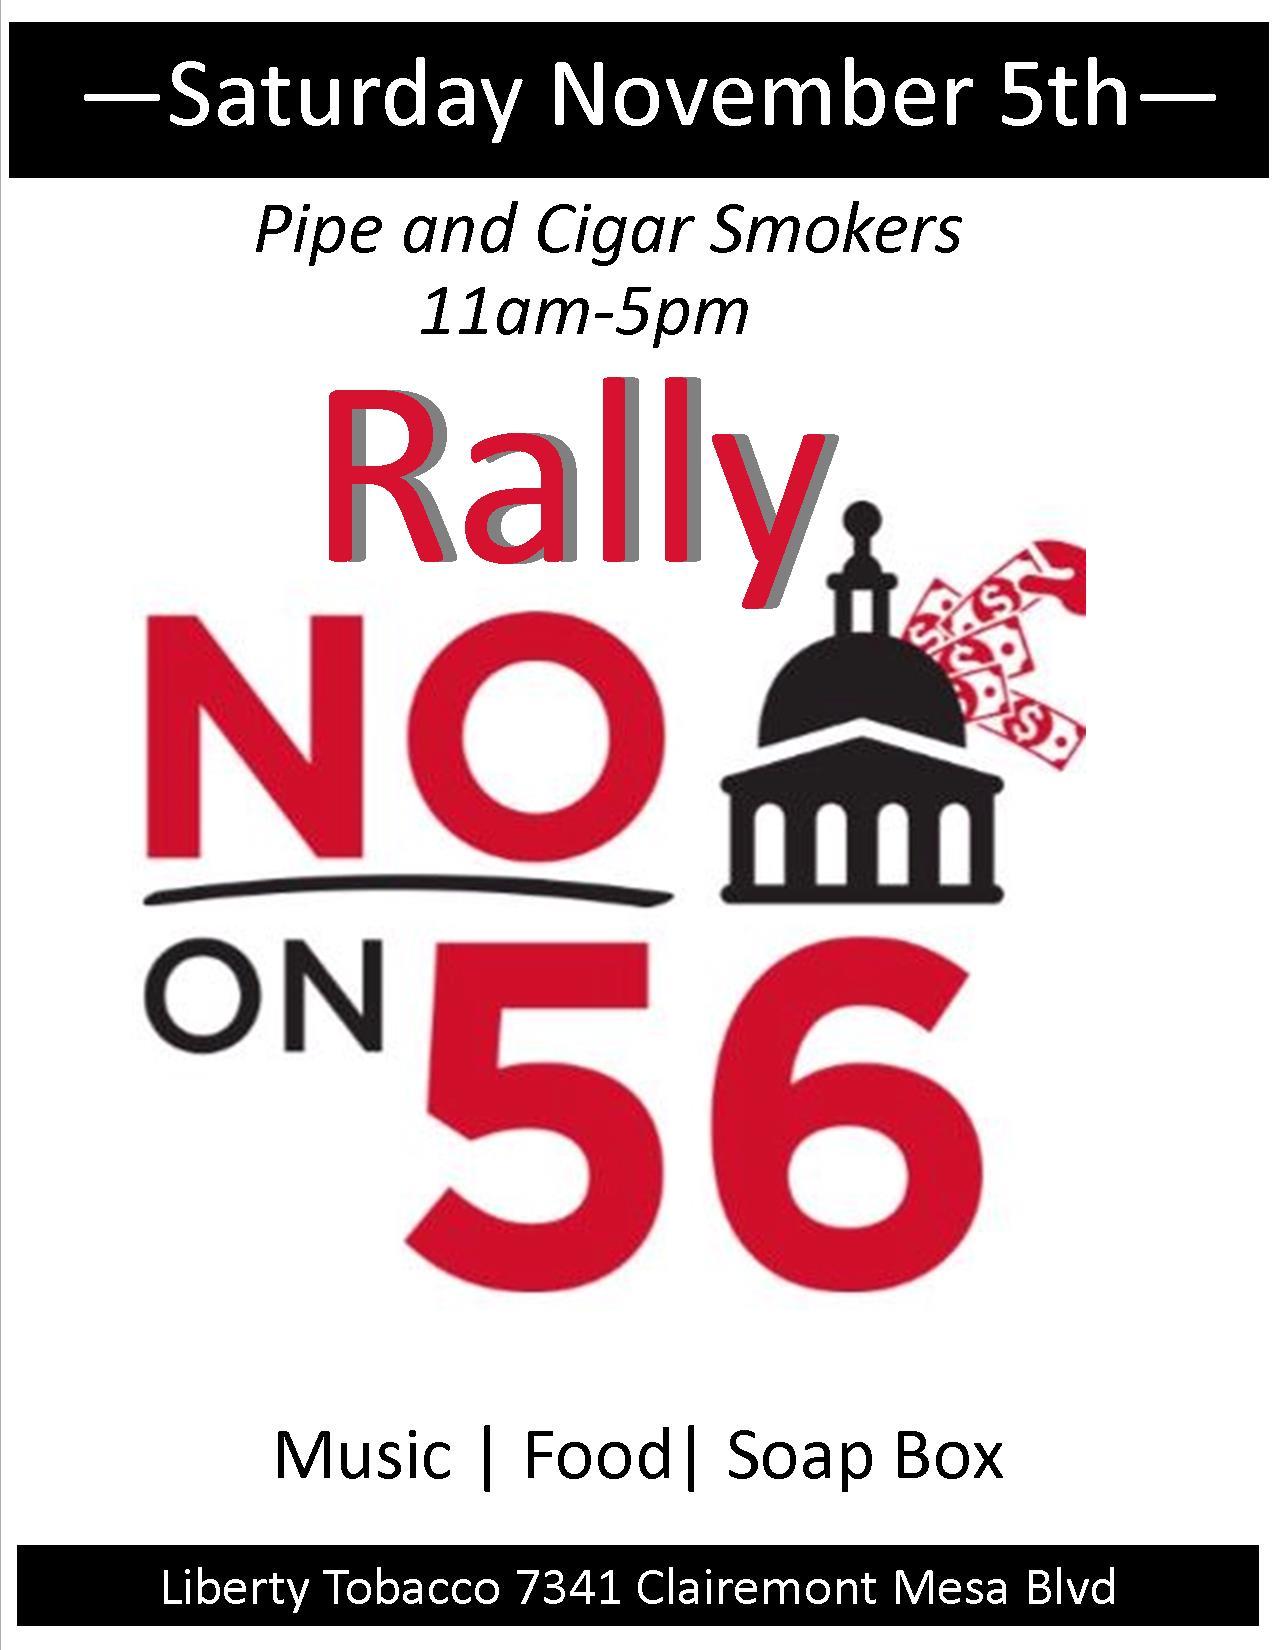 November 5th Rally for NO on Prop 56 at Liberty Tobacco